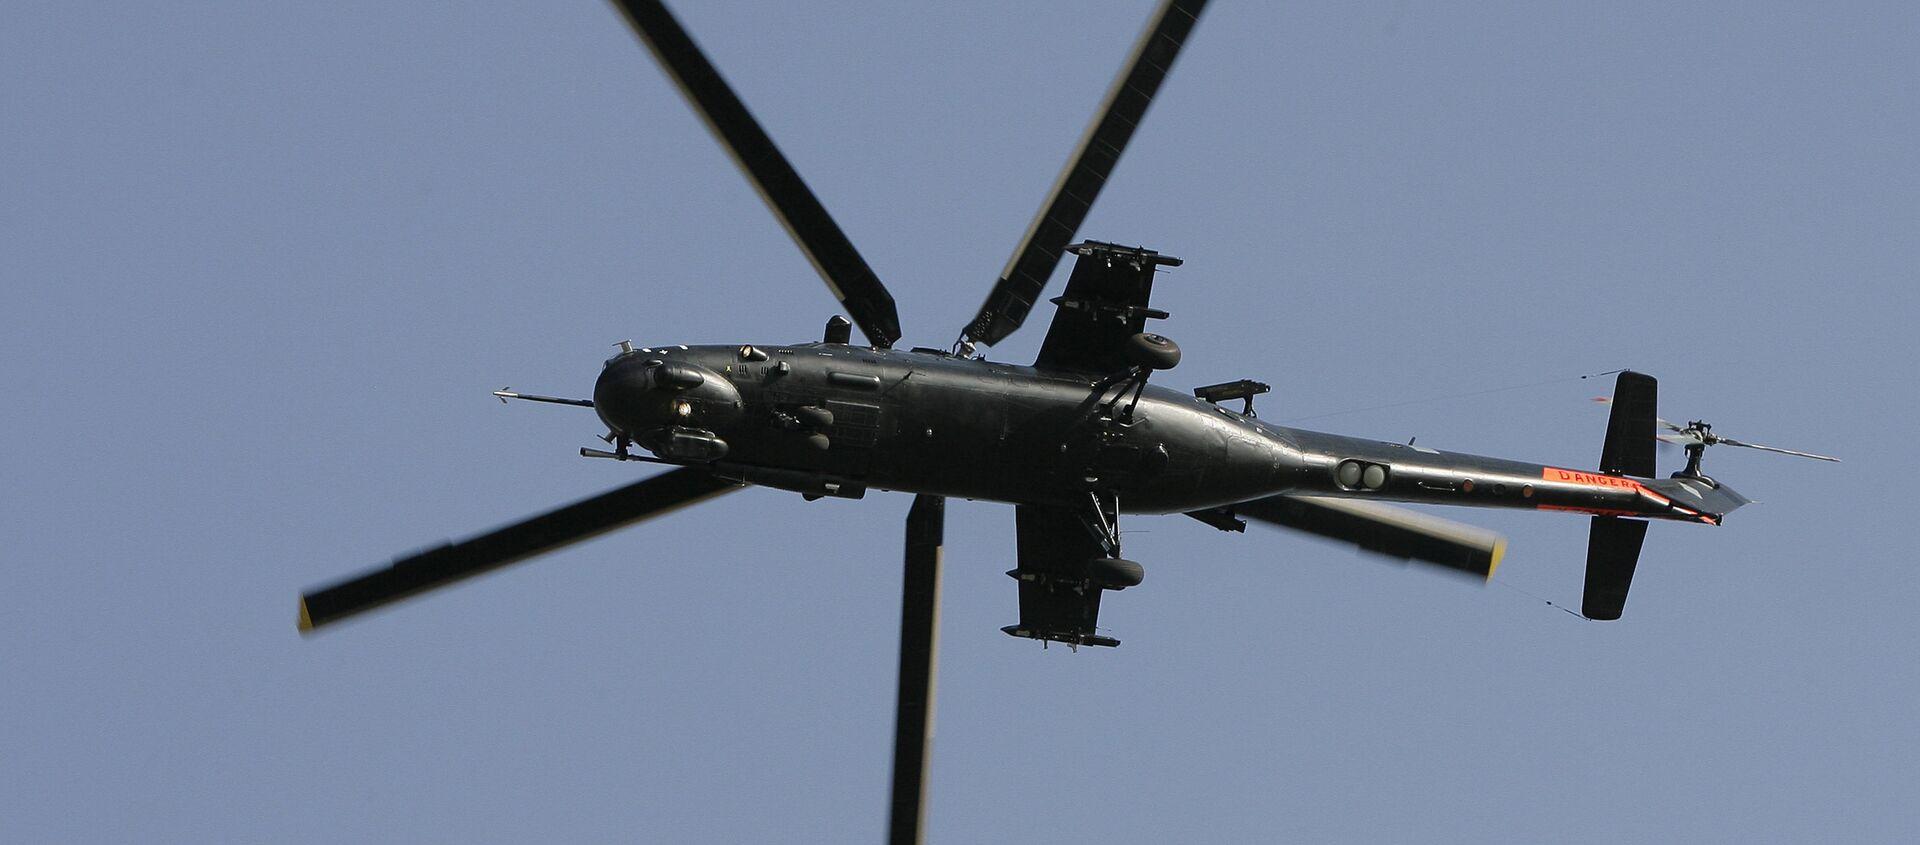 Helicóptero Mi-35M (archivo) - Sputnik Mundo, 1920, 01.02.2021